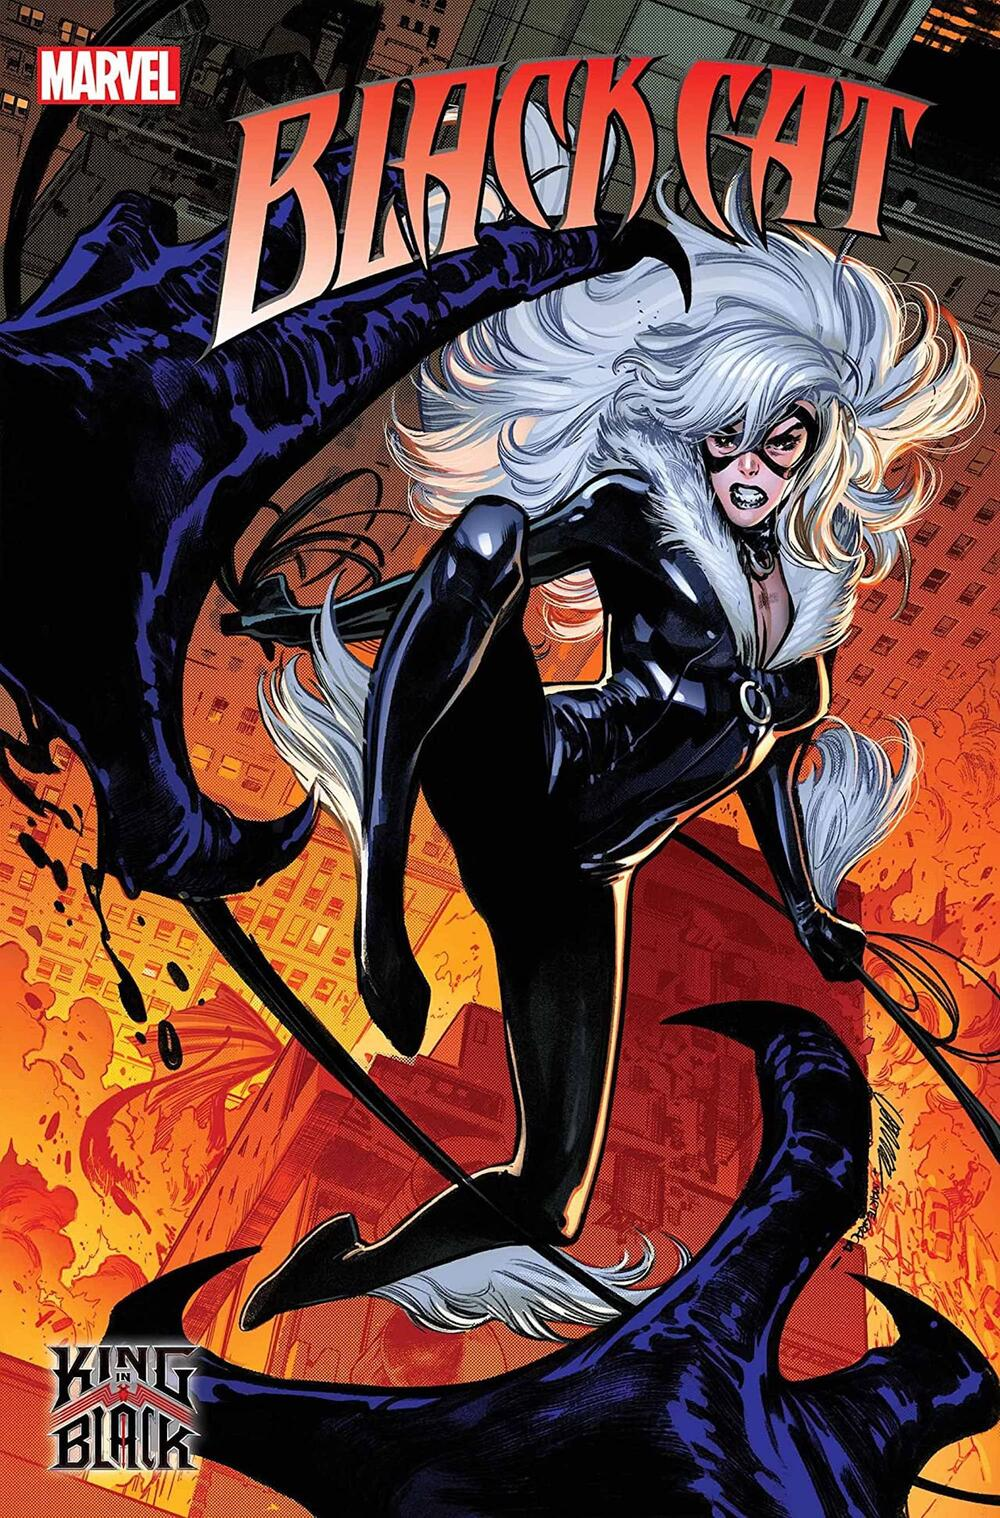 BLACK CAT #1 cover by Pepe Larraz